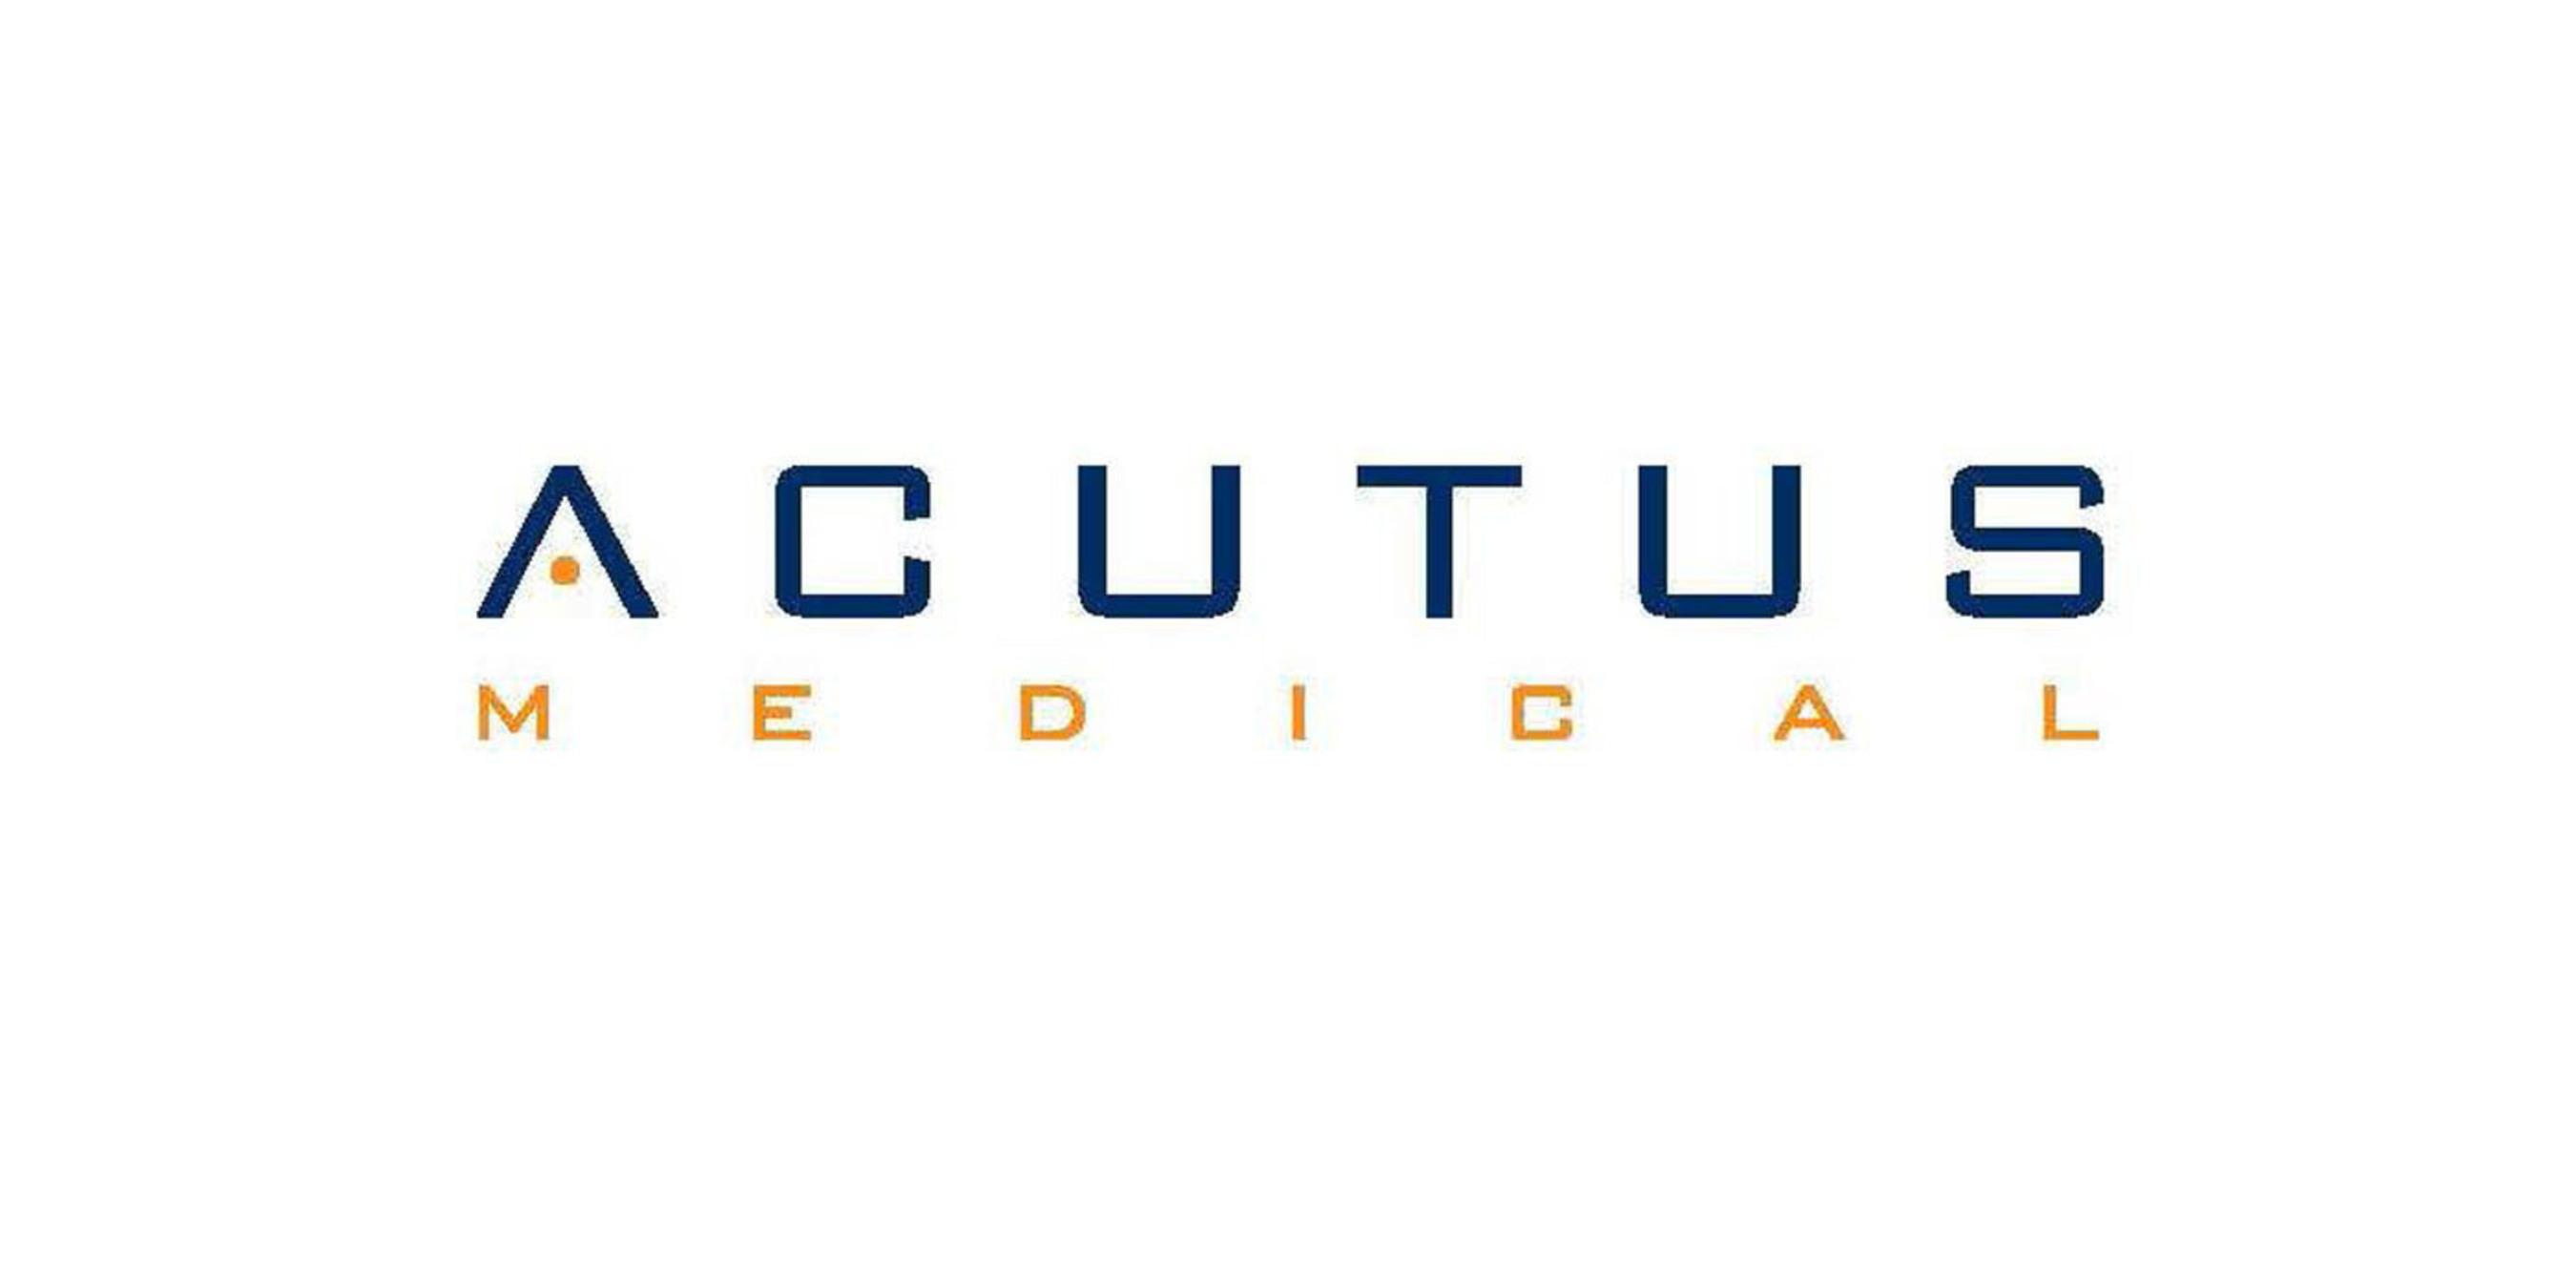 Acutus Medical, Inc. (PRNewsFoto/Acutus Medical, Inc.) (PRNewsFoto/)